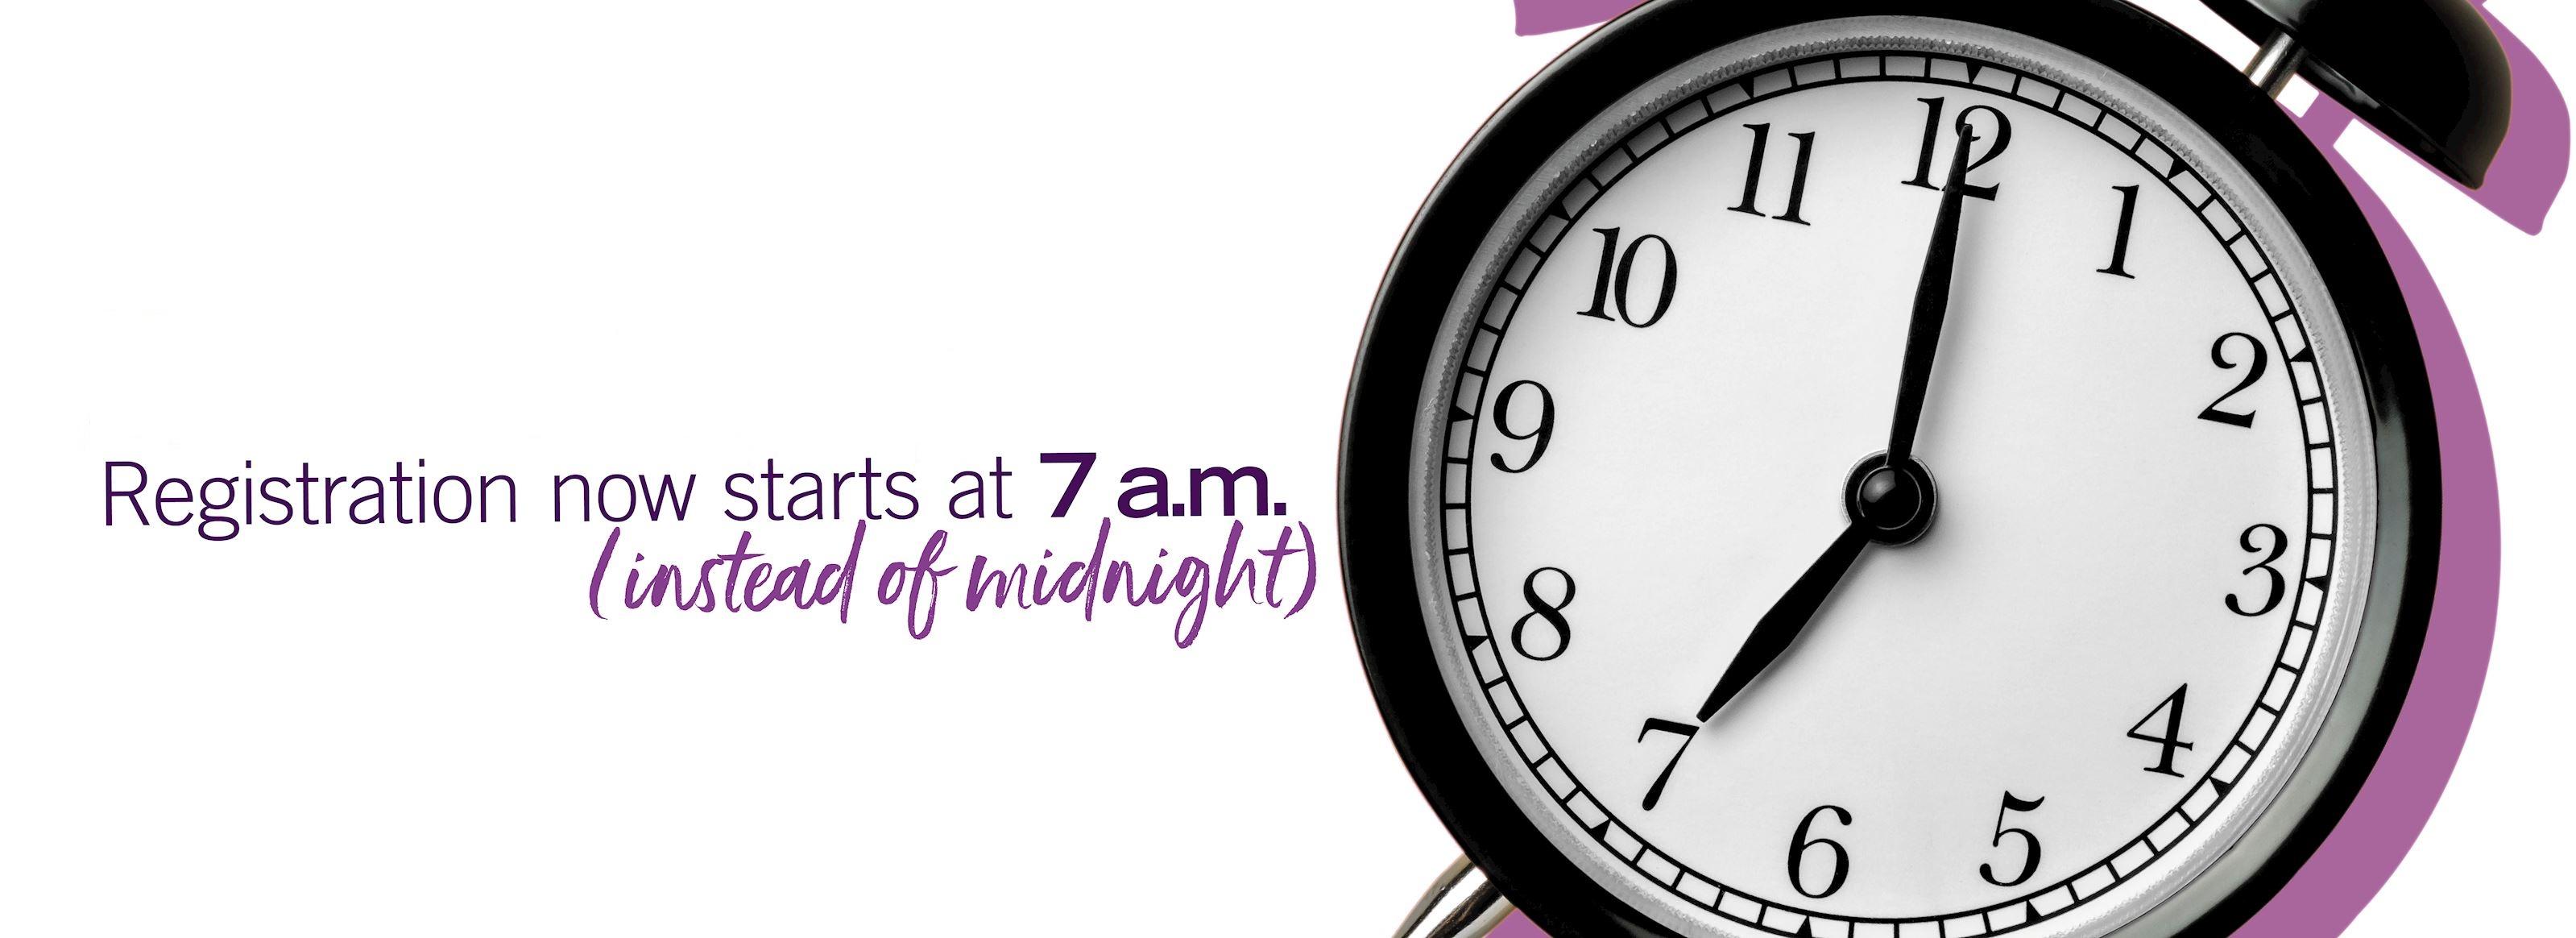 Registration starts at 7 A.M.